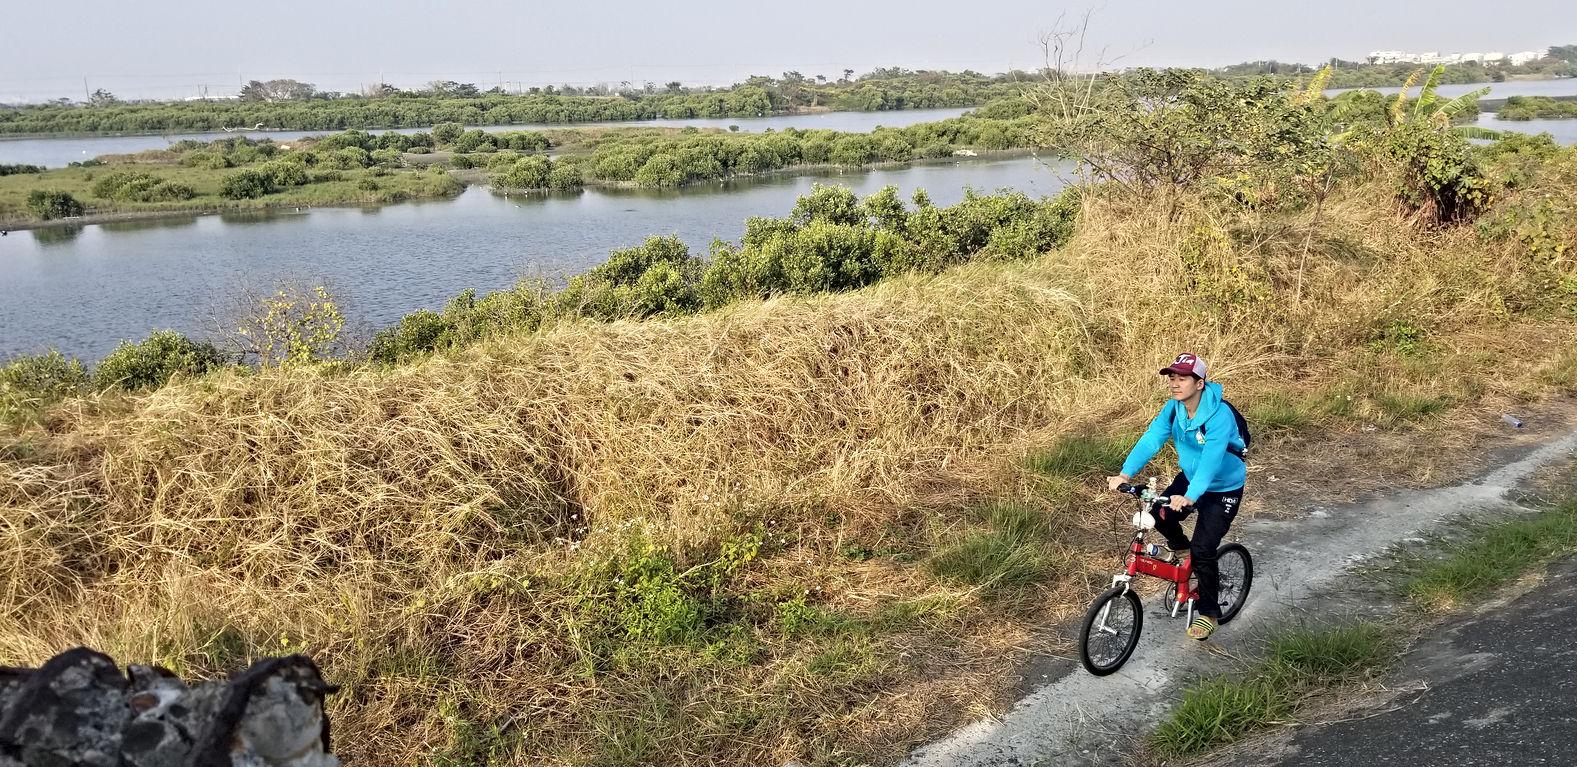 湖濱水鳥公園wetland anping